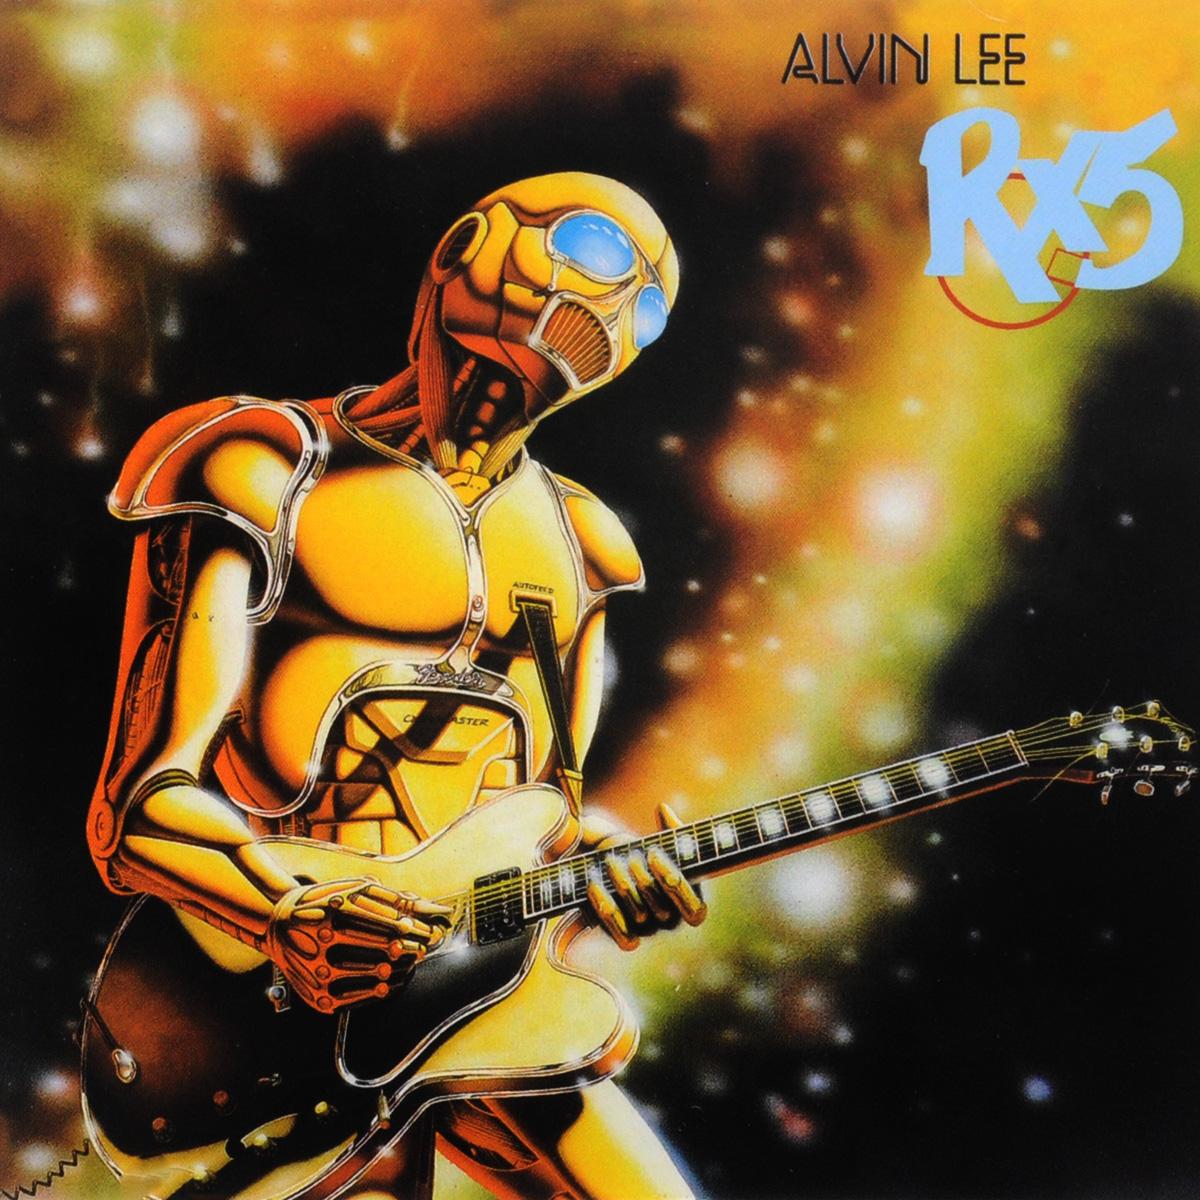 Алвин Ли Alvin Lee. RX5 alvin lee alvin lee ten years la ride on 180 gr